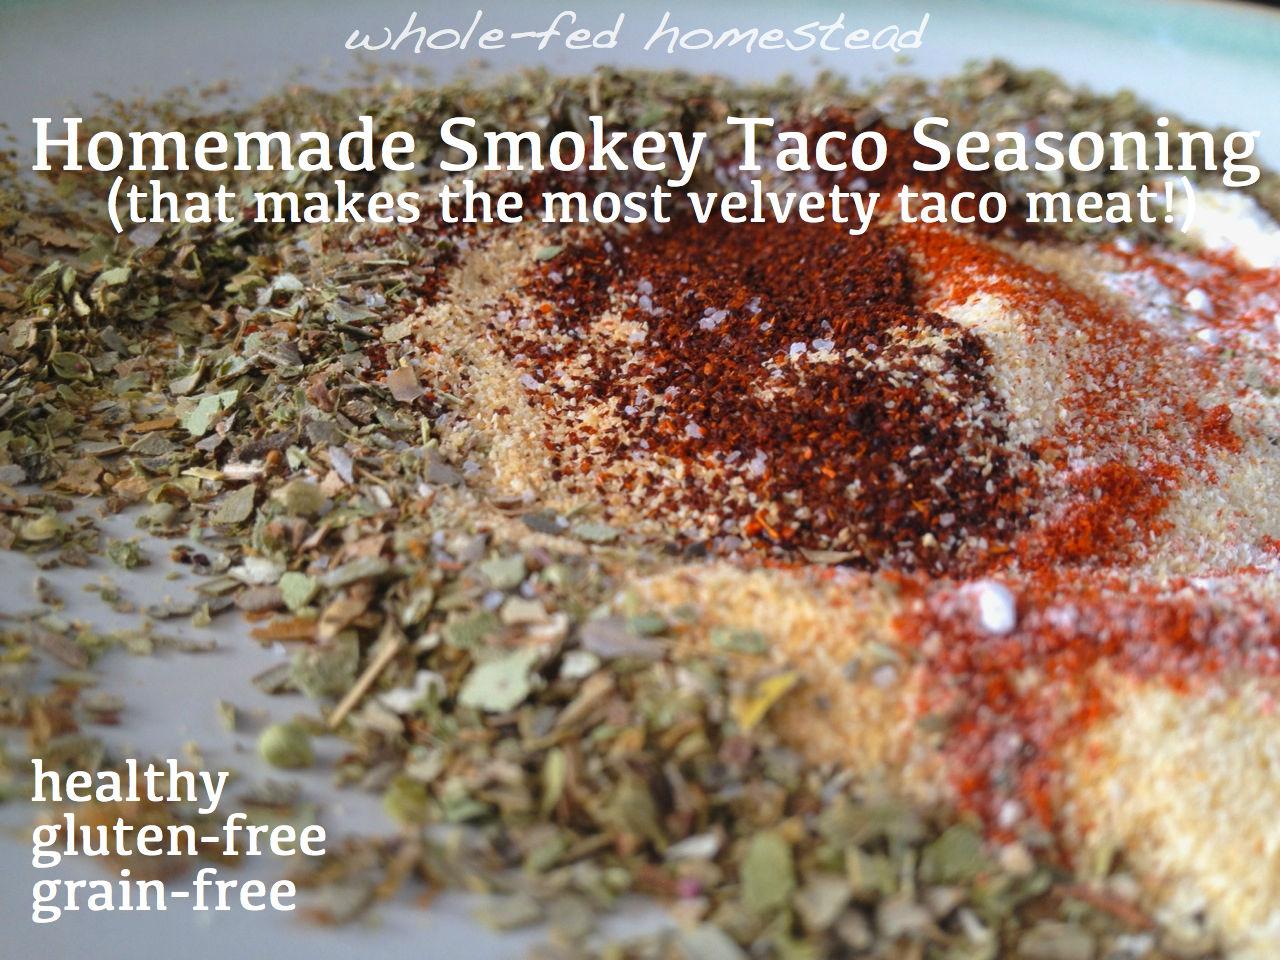 Homemade Smokey Taco Seasoning that Makes the Most Velvety Taco Meat